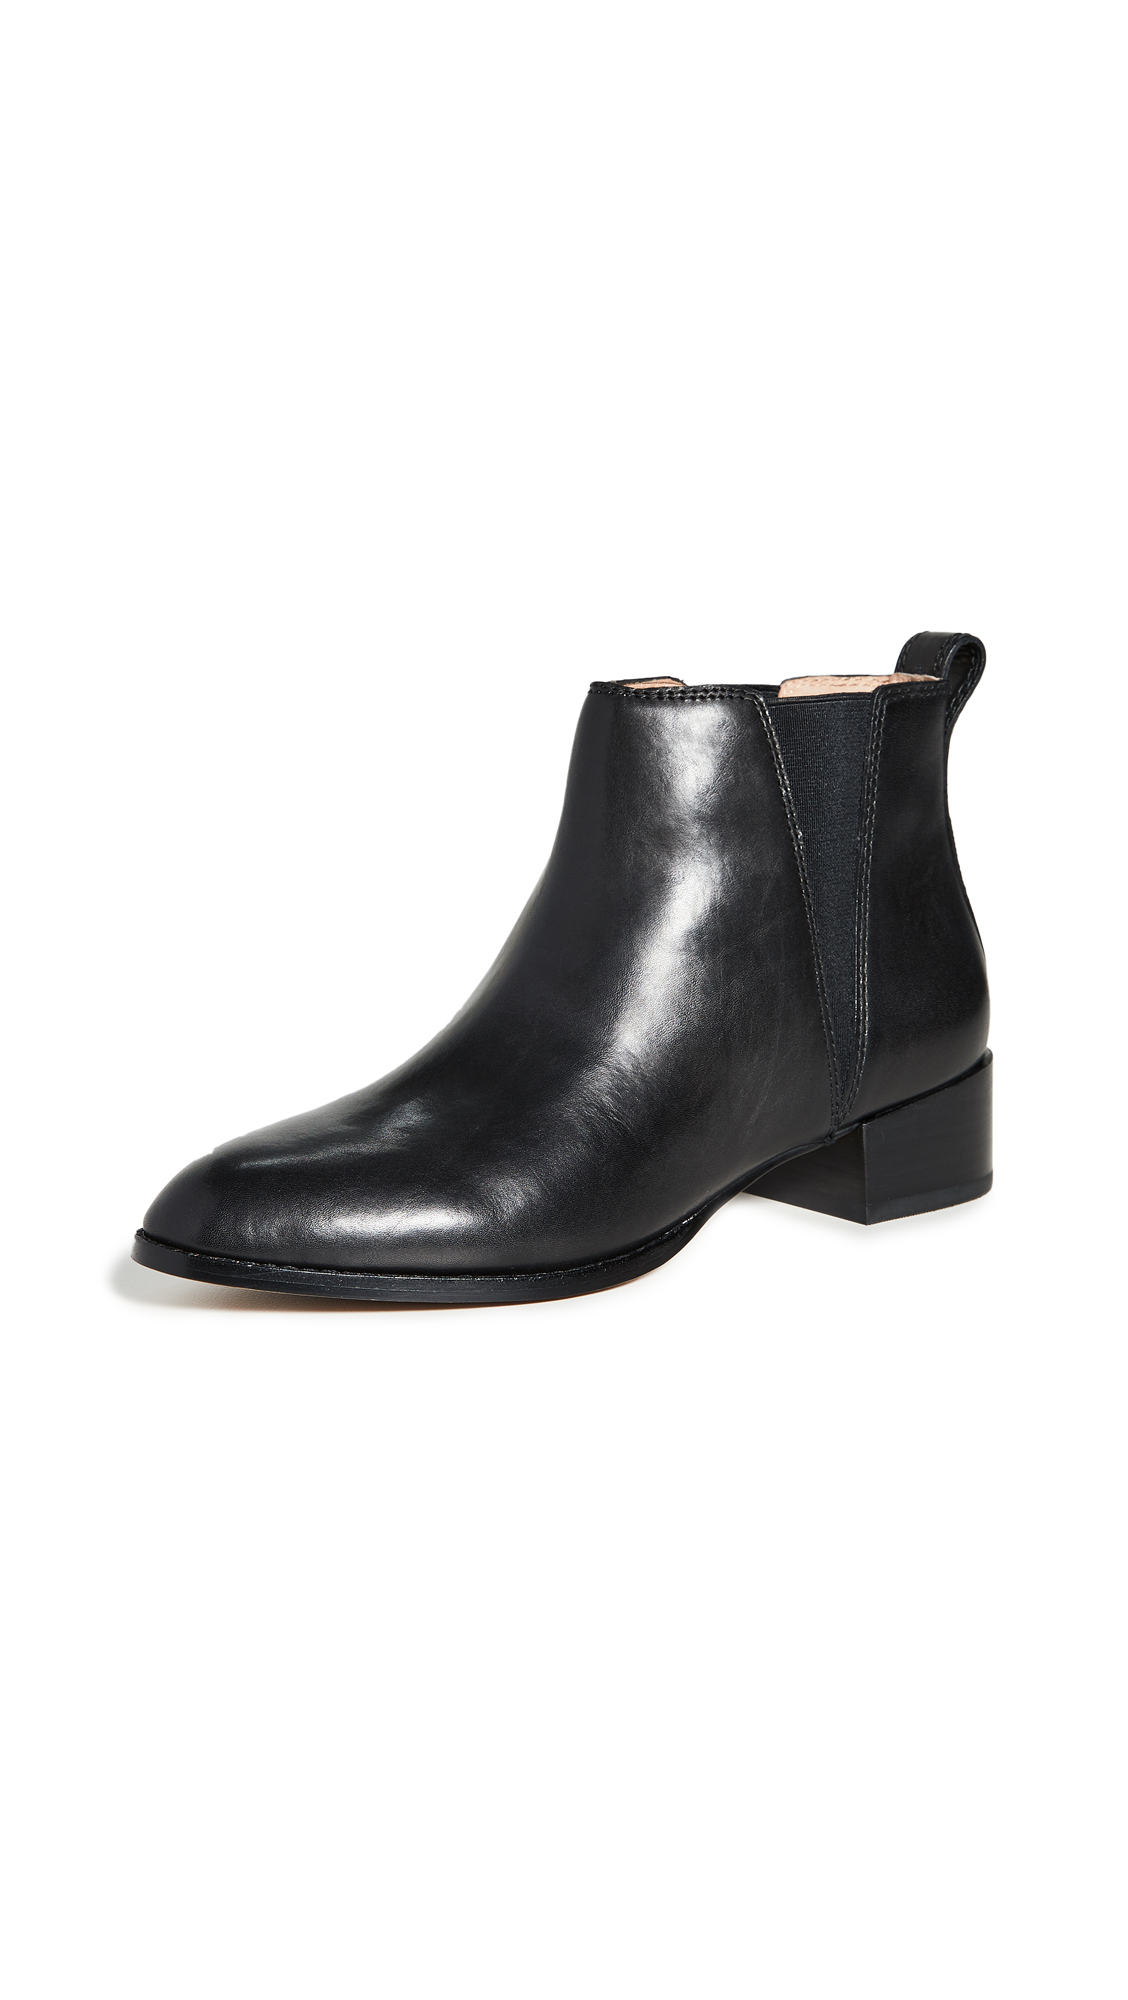 Madewell The Carina Block Heel Booties - 50% Off Sale